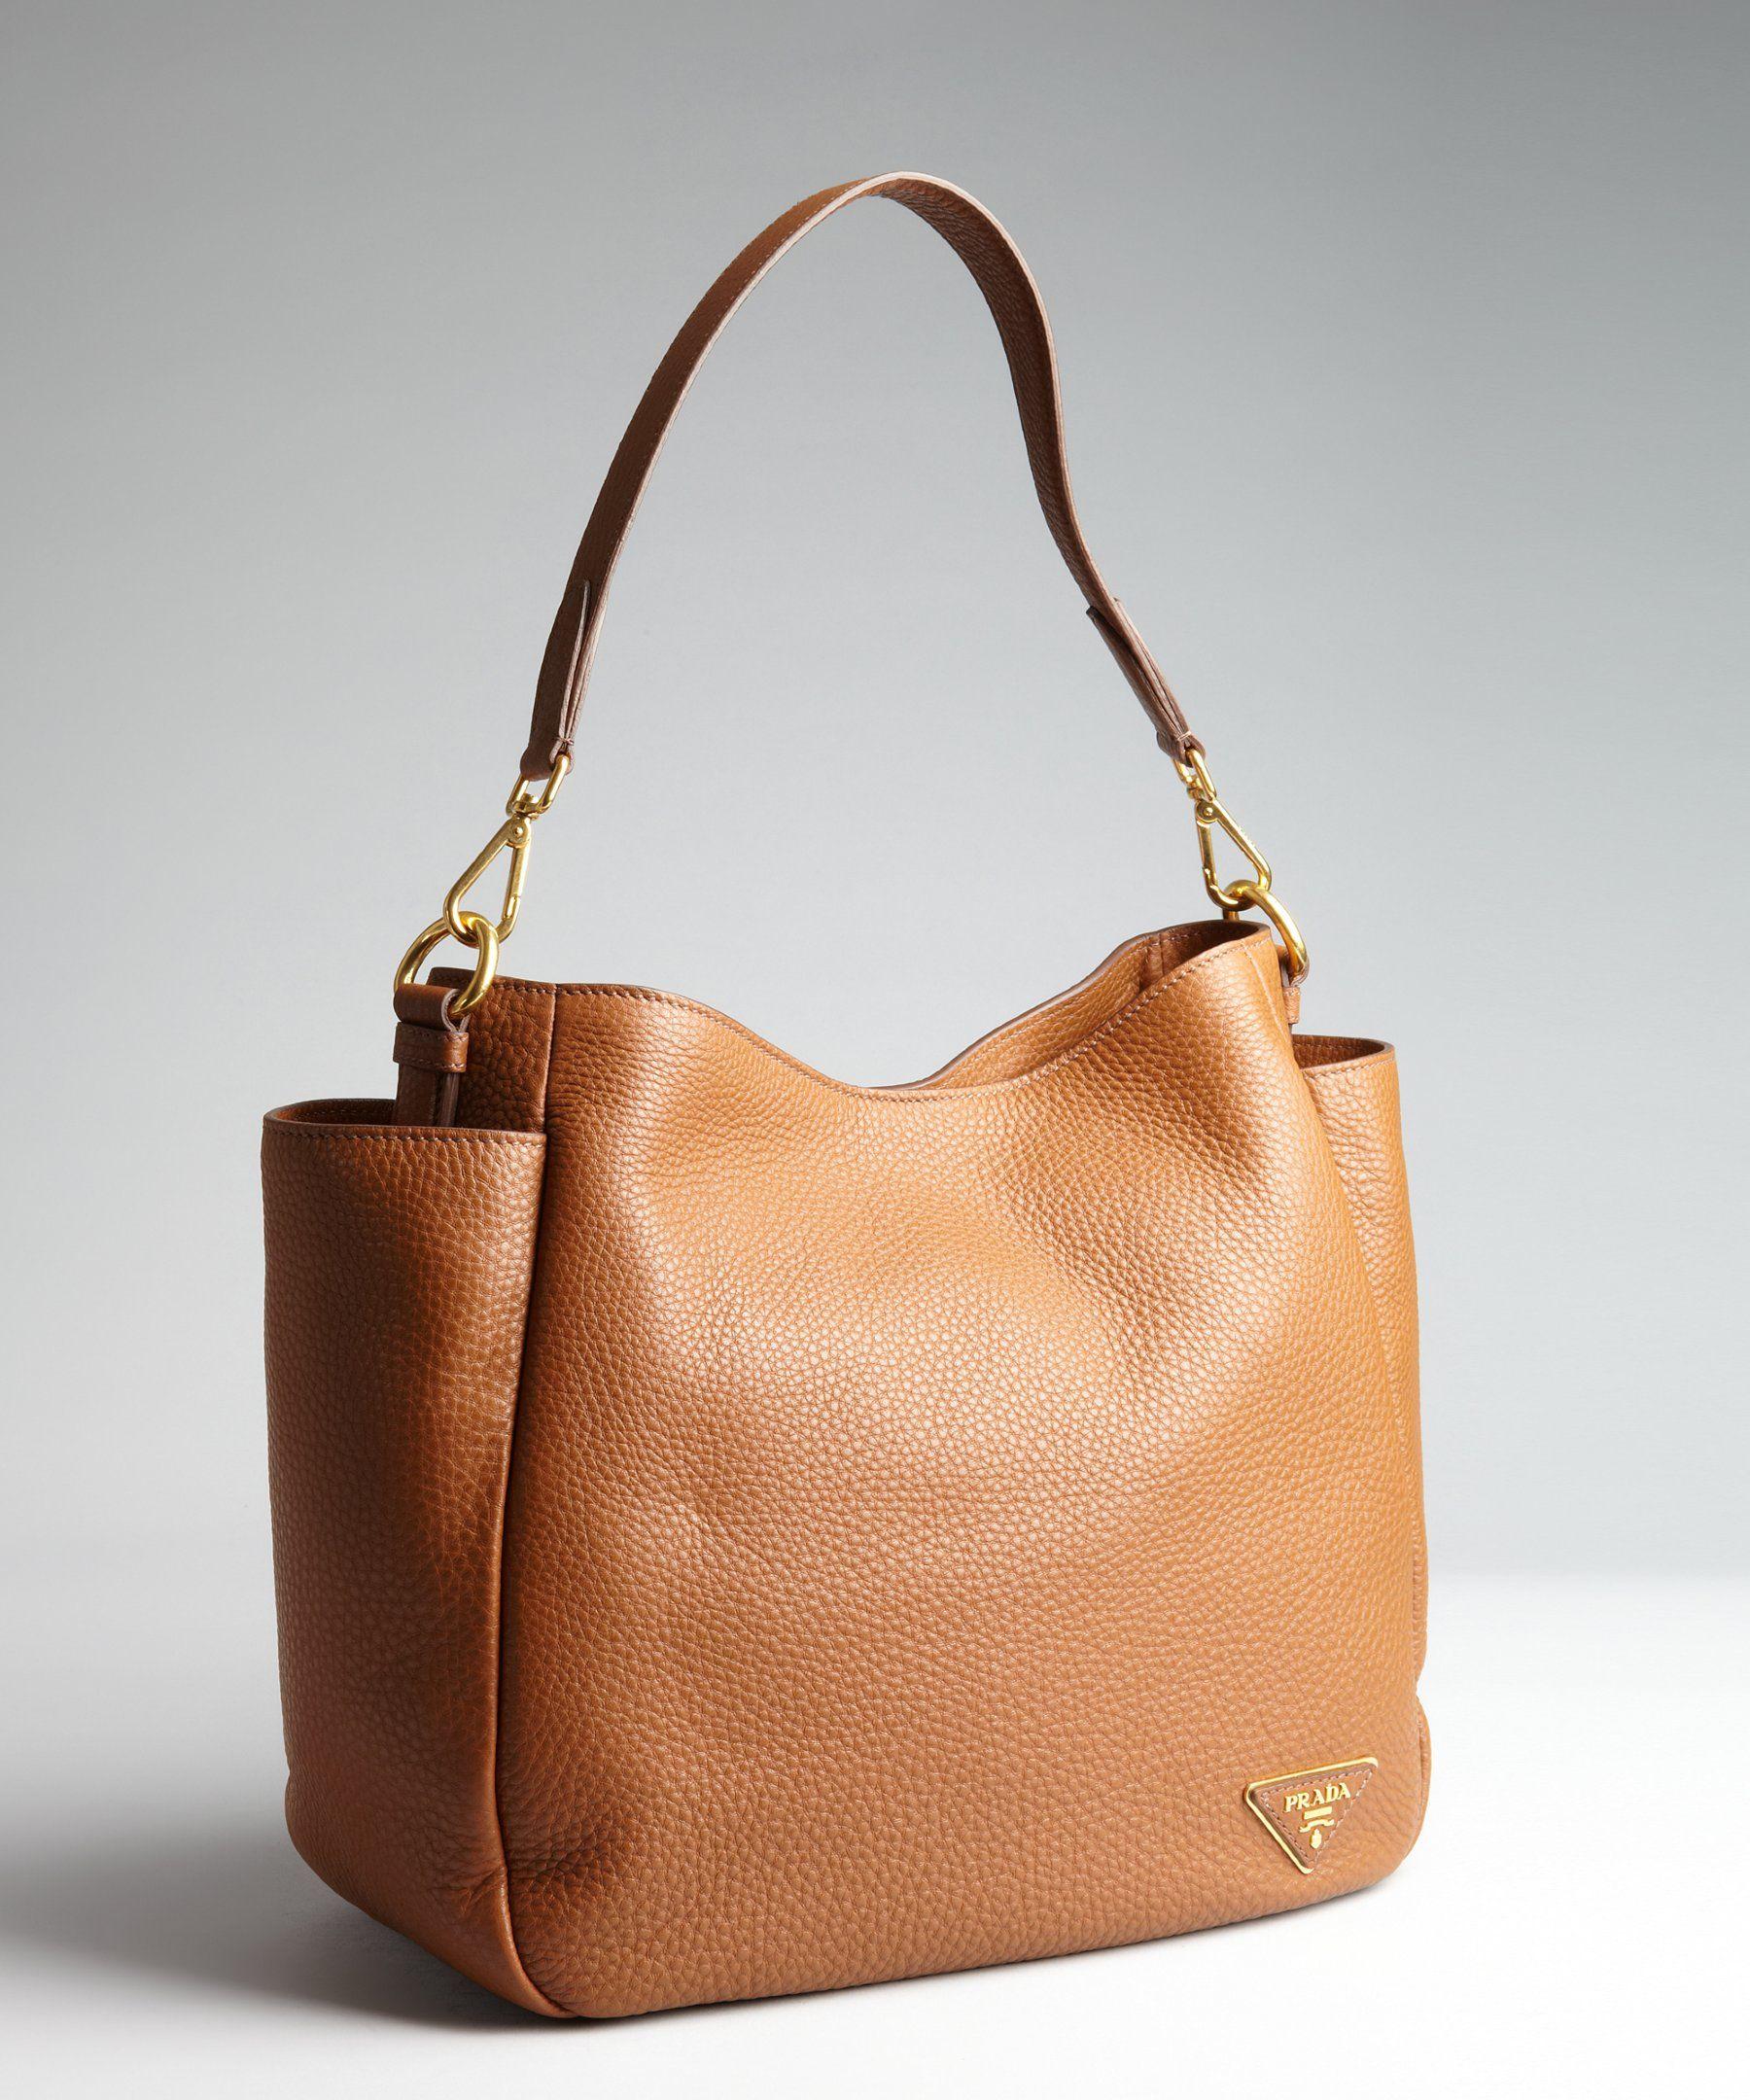 5414f13423 Prada brandy pebbled leather logo embellished hobo bag